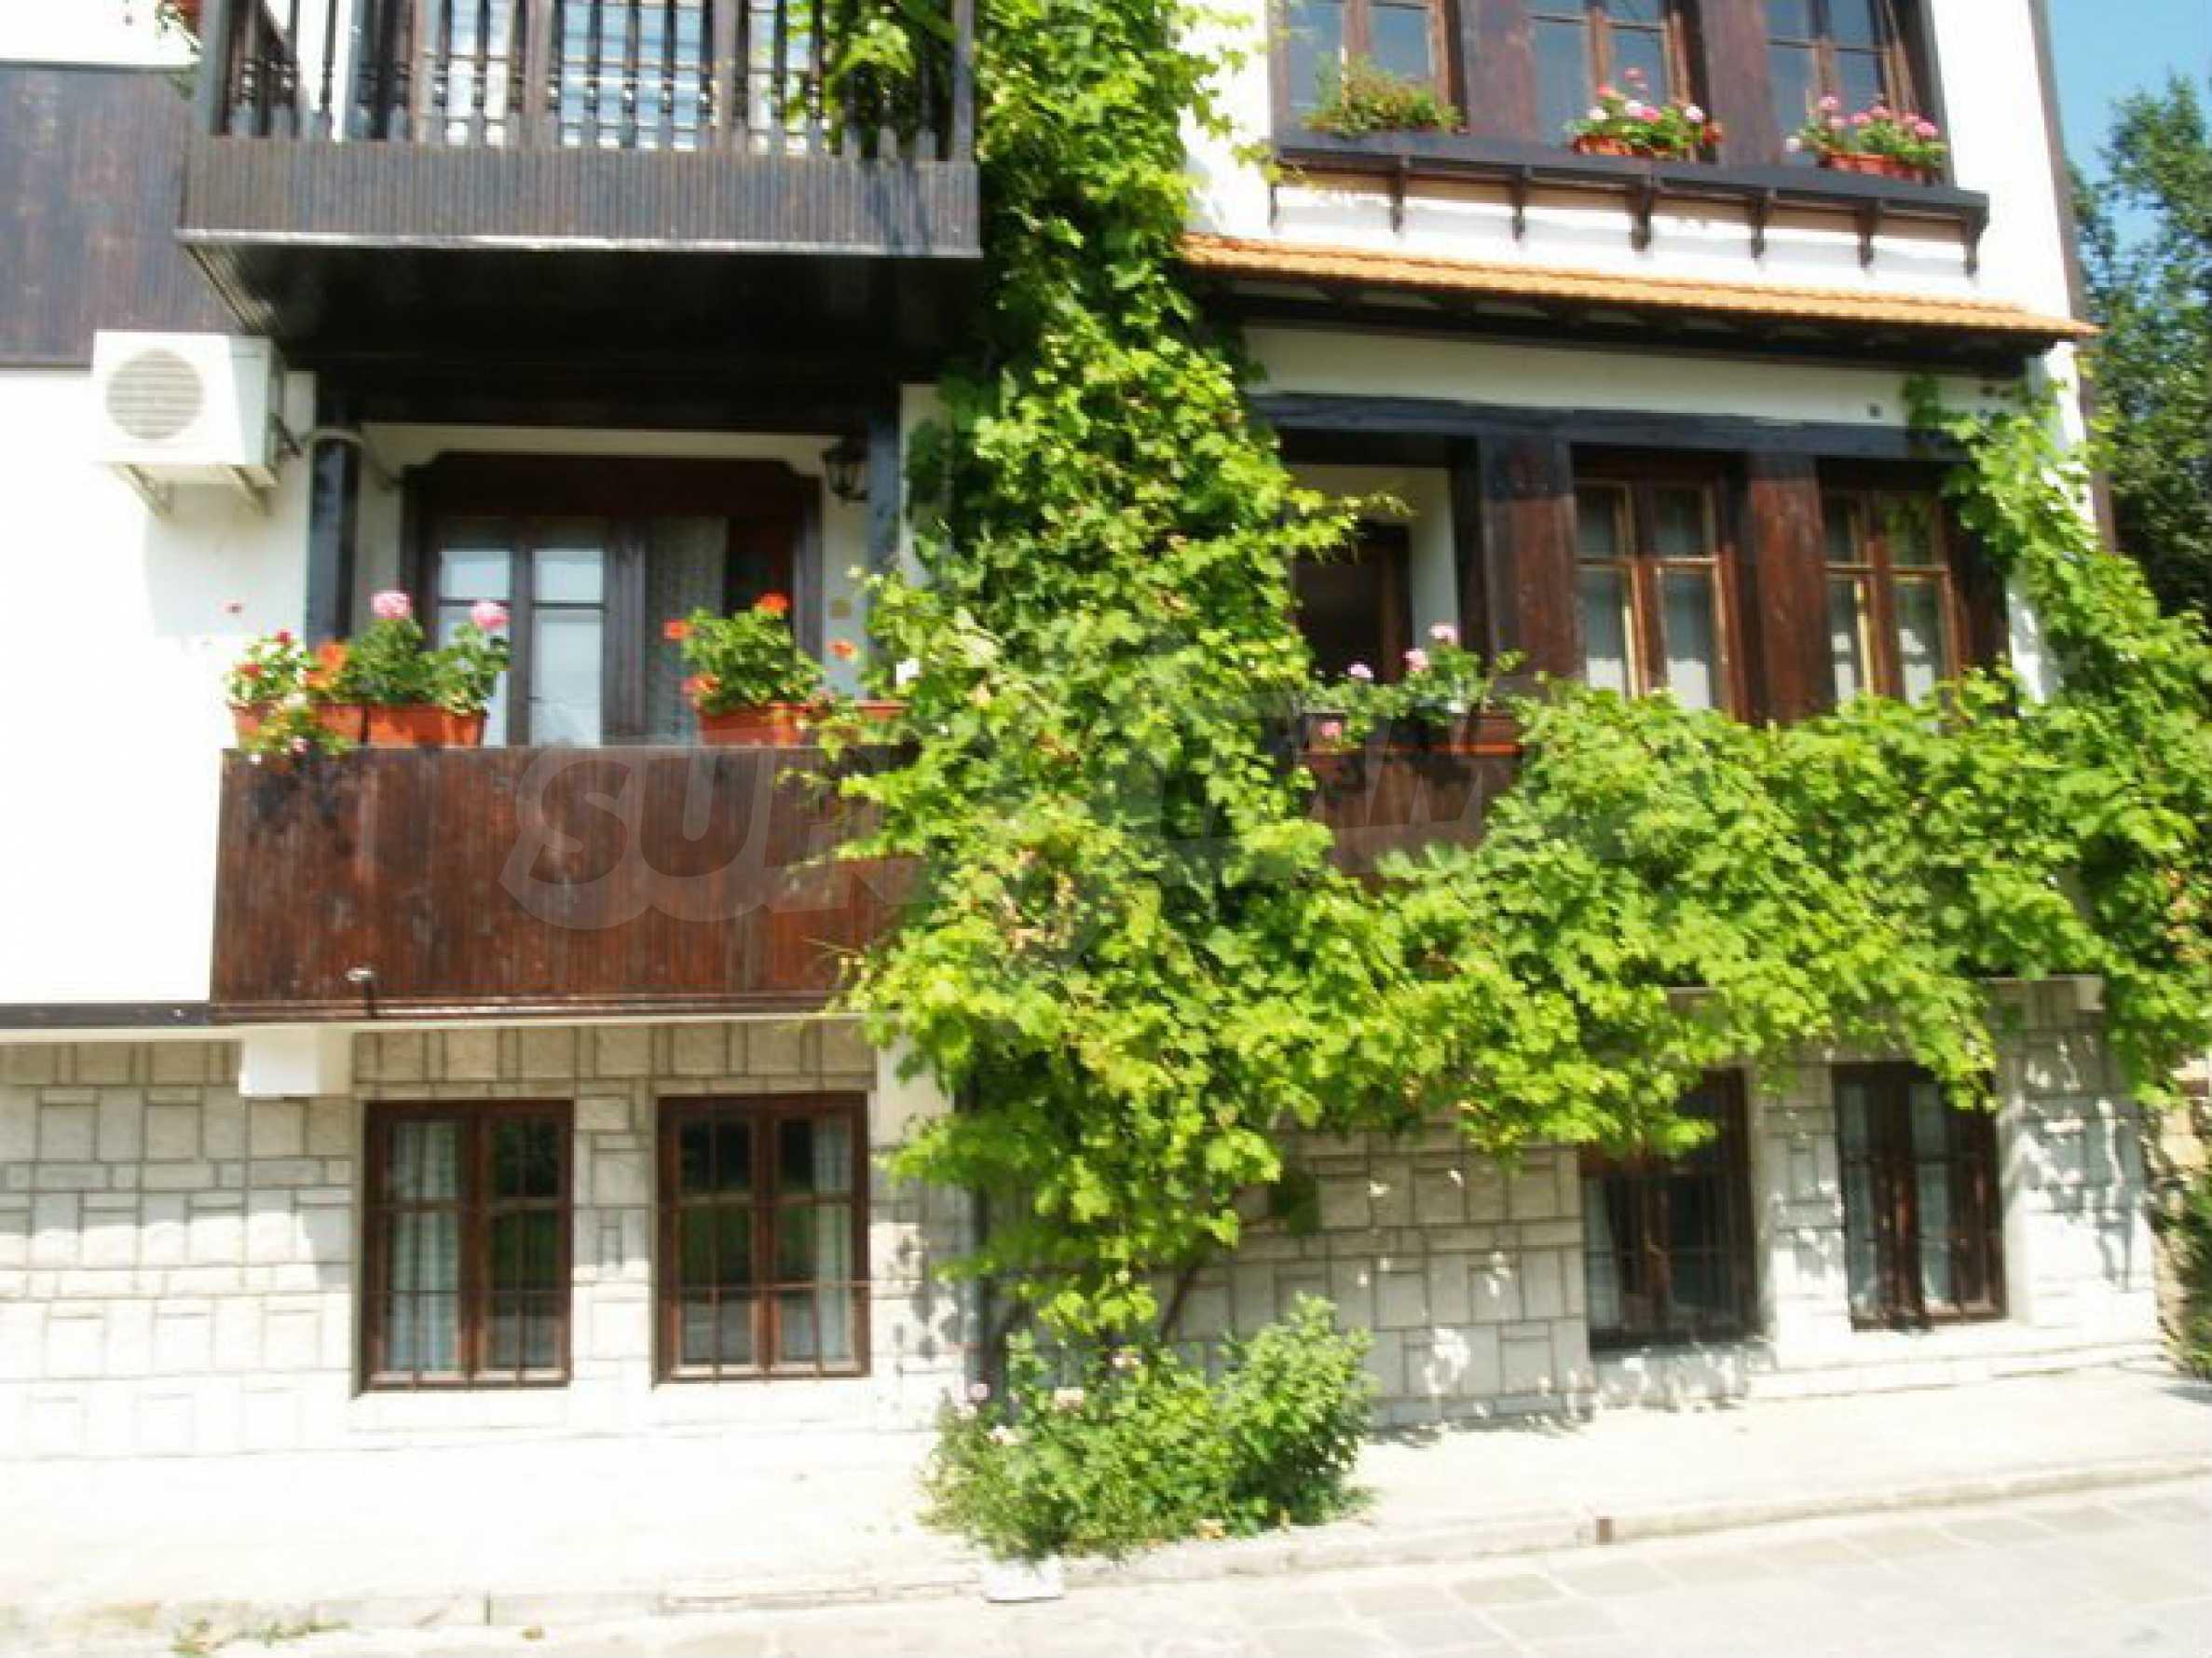 Hotelanlage mit Restaurant am Ufer des Flusses Osam in Lovech 7